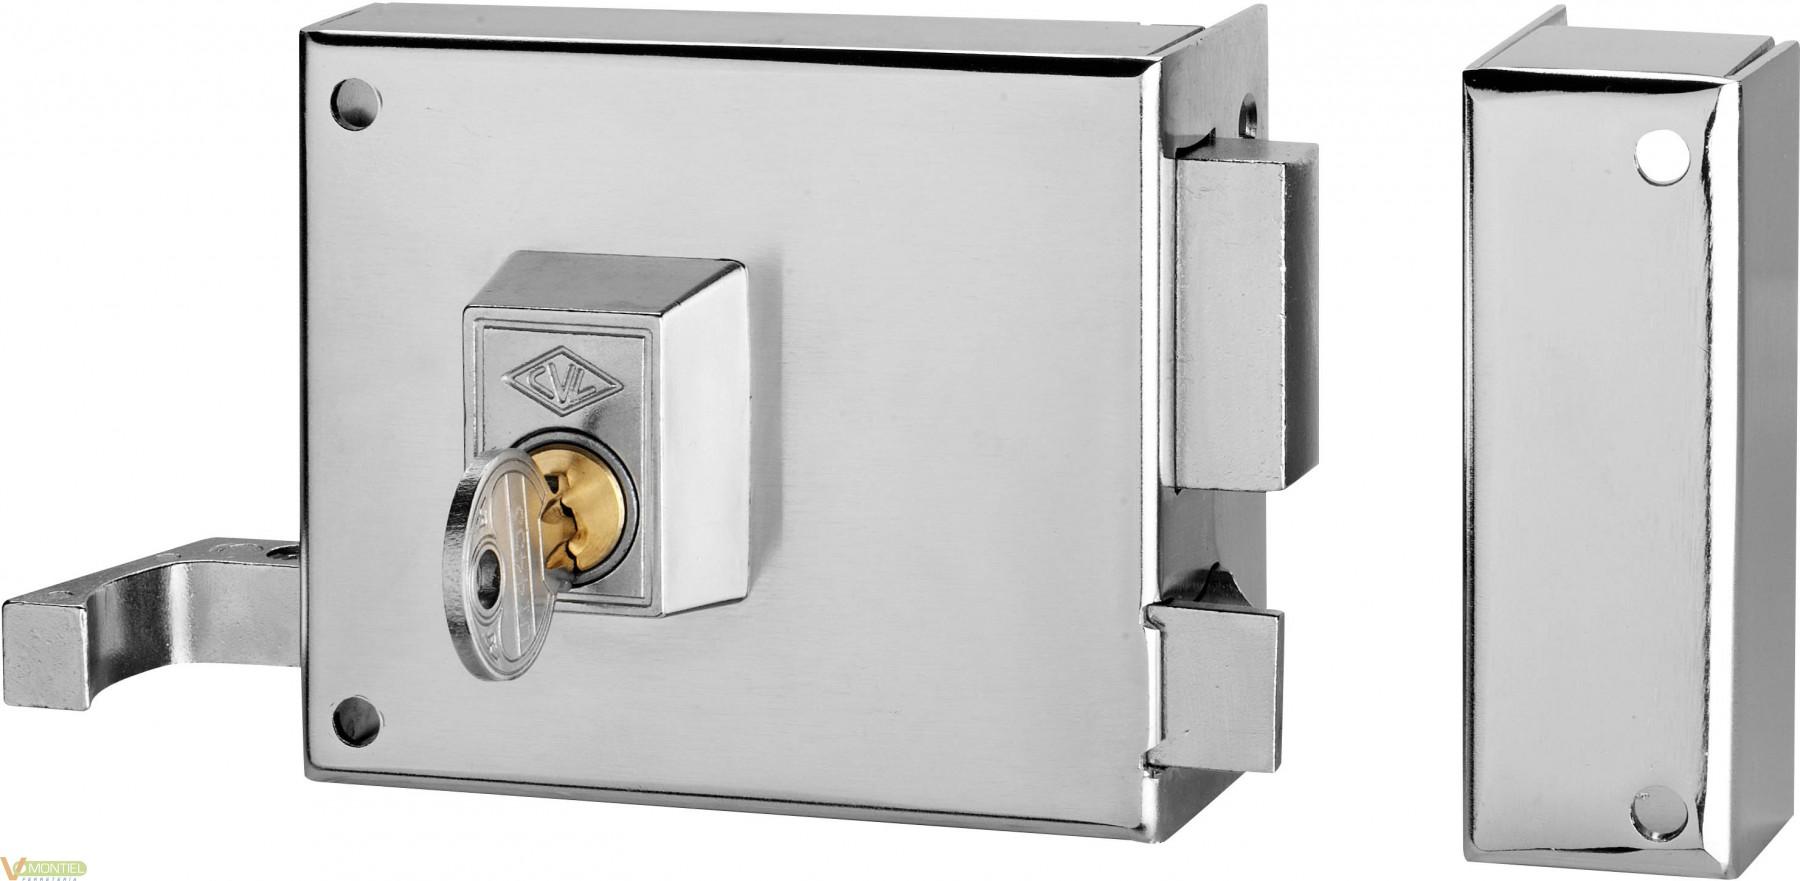 Cerradura sobr. 120x60mm 125a1-0